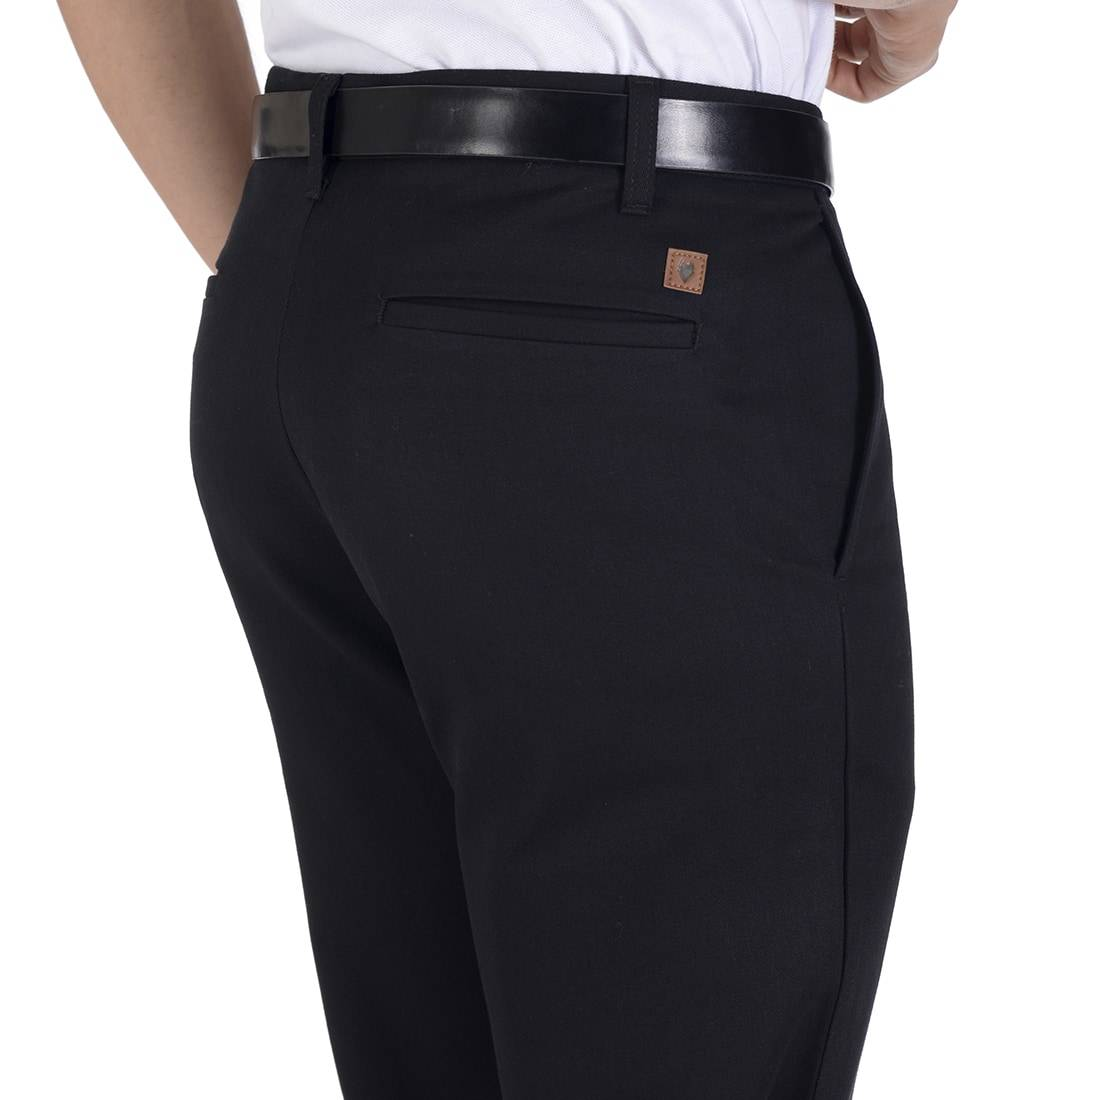 010789055209-04-Pantalon-Casual-Classic-Fit-Negro-yale